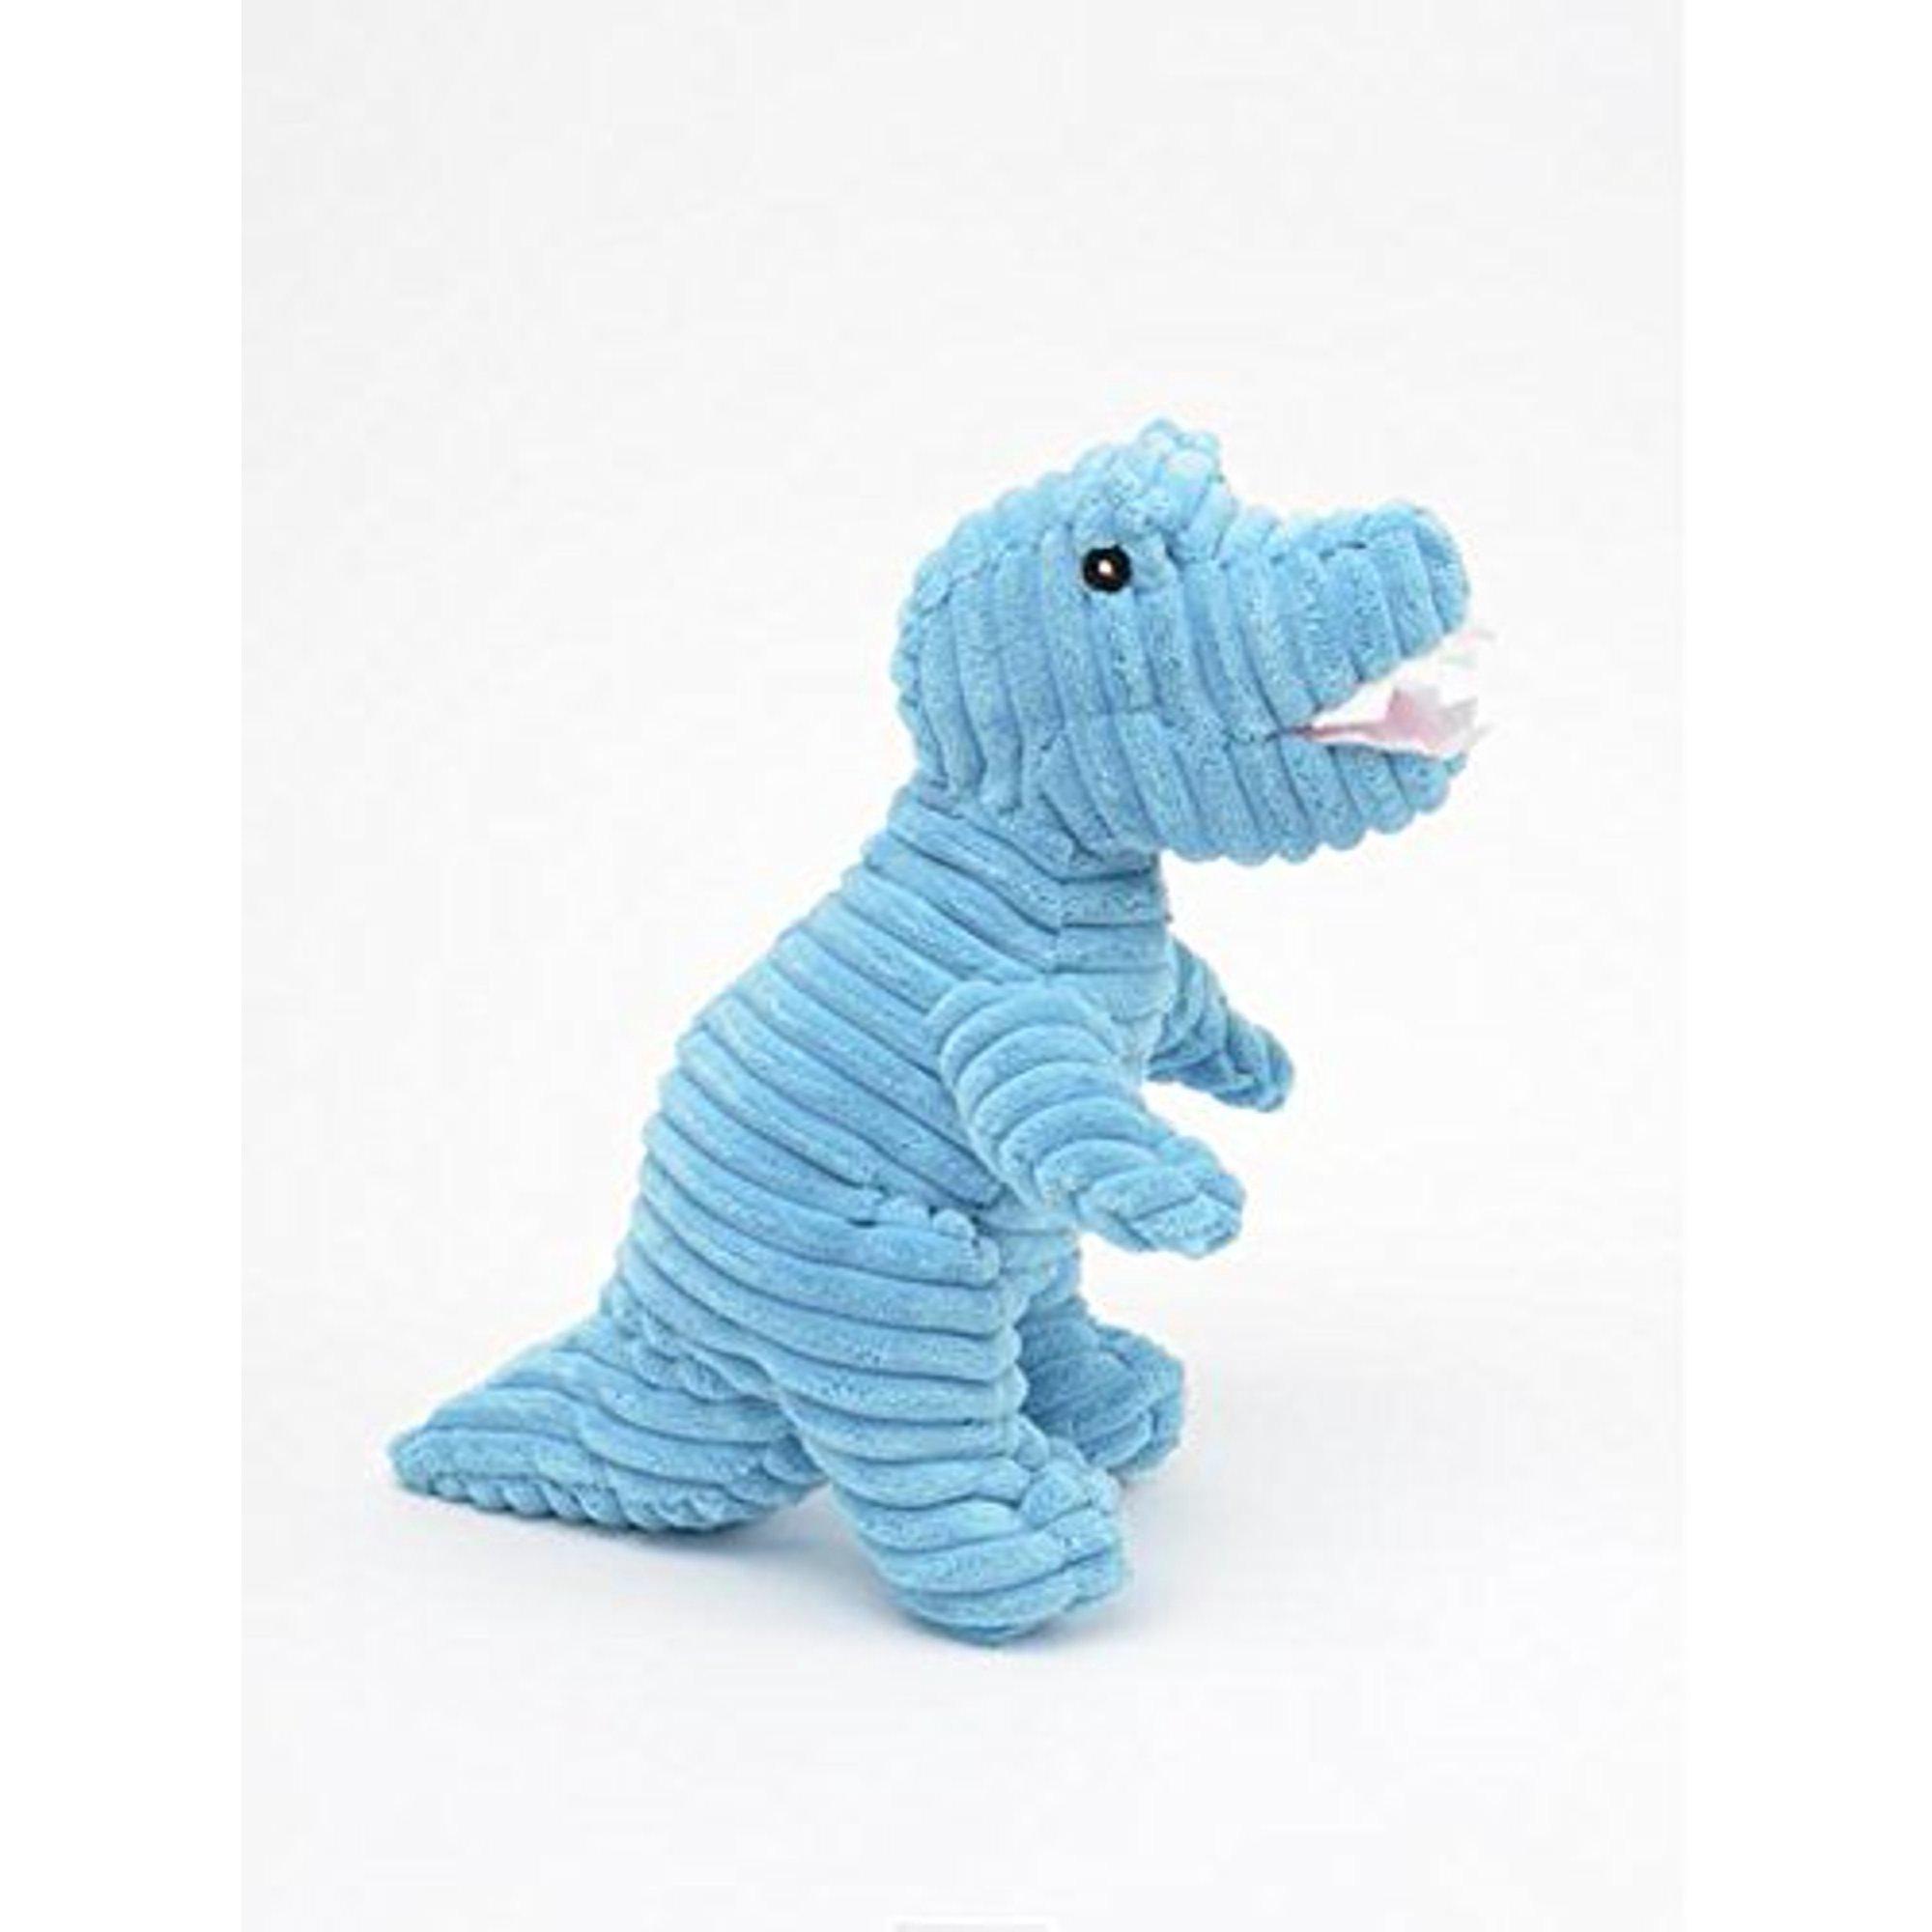 Teddy Bear Stuffed Toy, Unipak Designs Kids Baby Staffed Animal Kordy Dino Dinosaur Jr Toy Walmart Canada